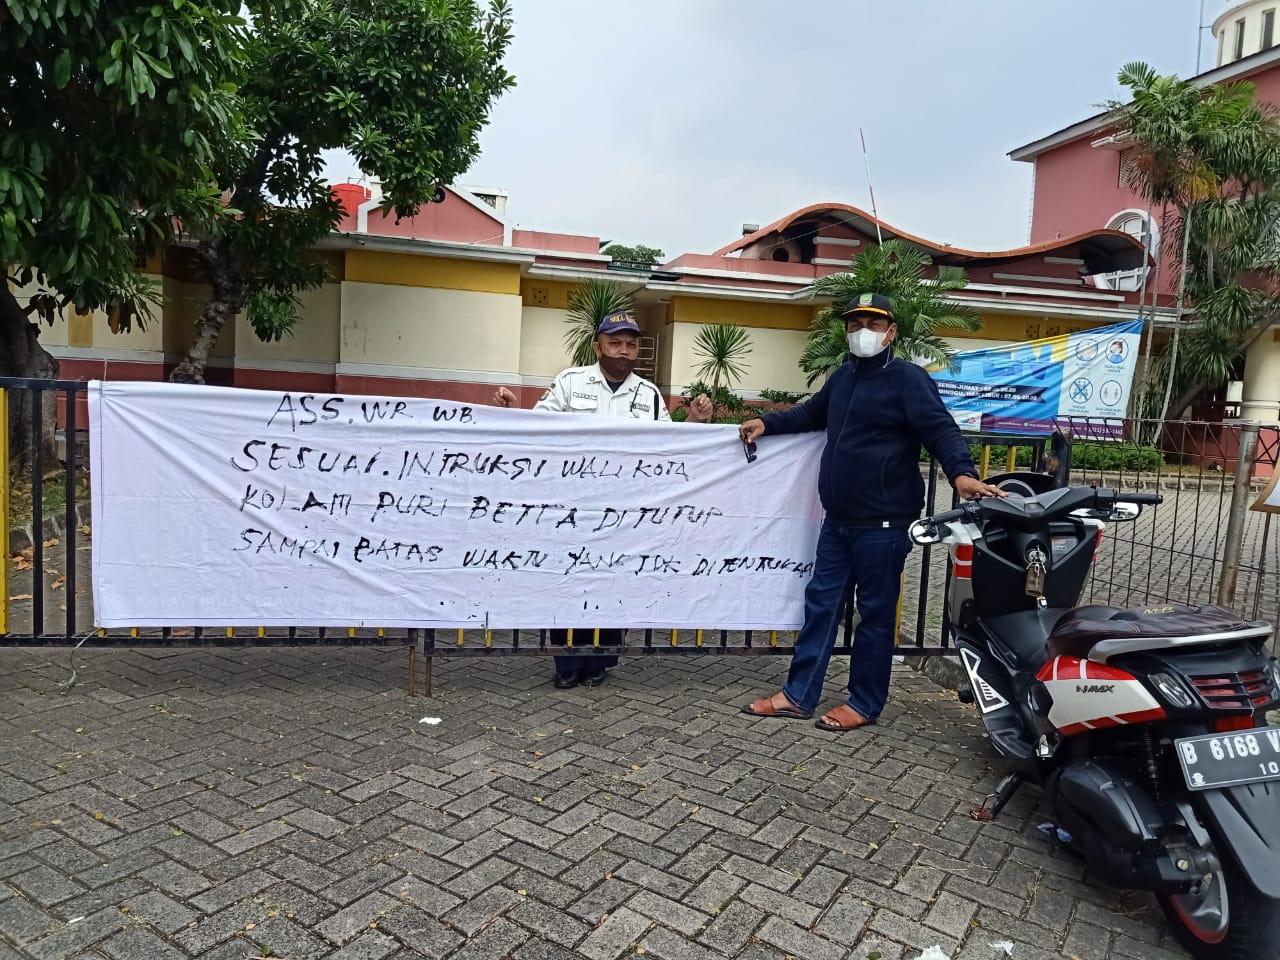 Wisata kolam renang di Puri Beta 1, Kelurahan Larangan Utara, Kecamatan Larangan ditutup yang disidak langsung oleh Lurah Larangan Utara Iwan Bambang Subekti, Kota Tangerang, Minggu (16/5/2021).